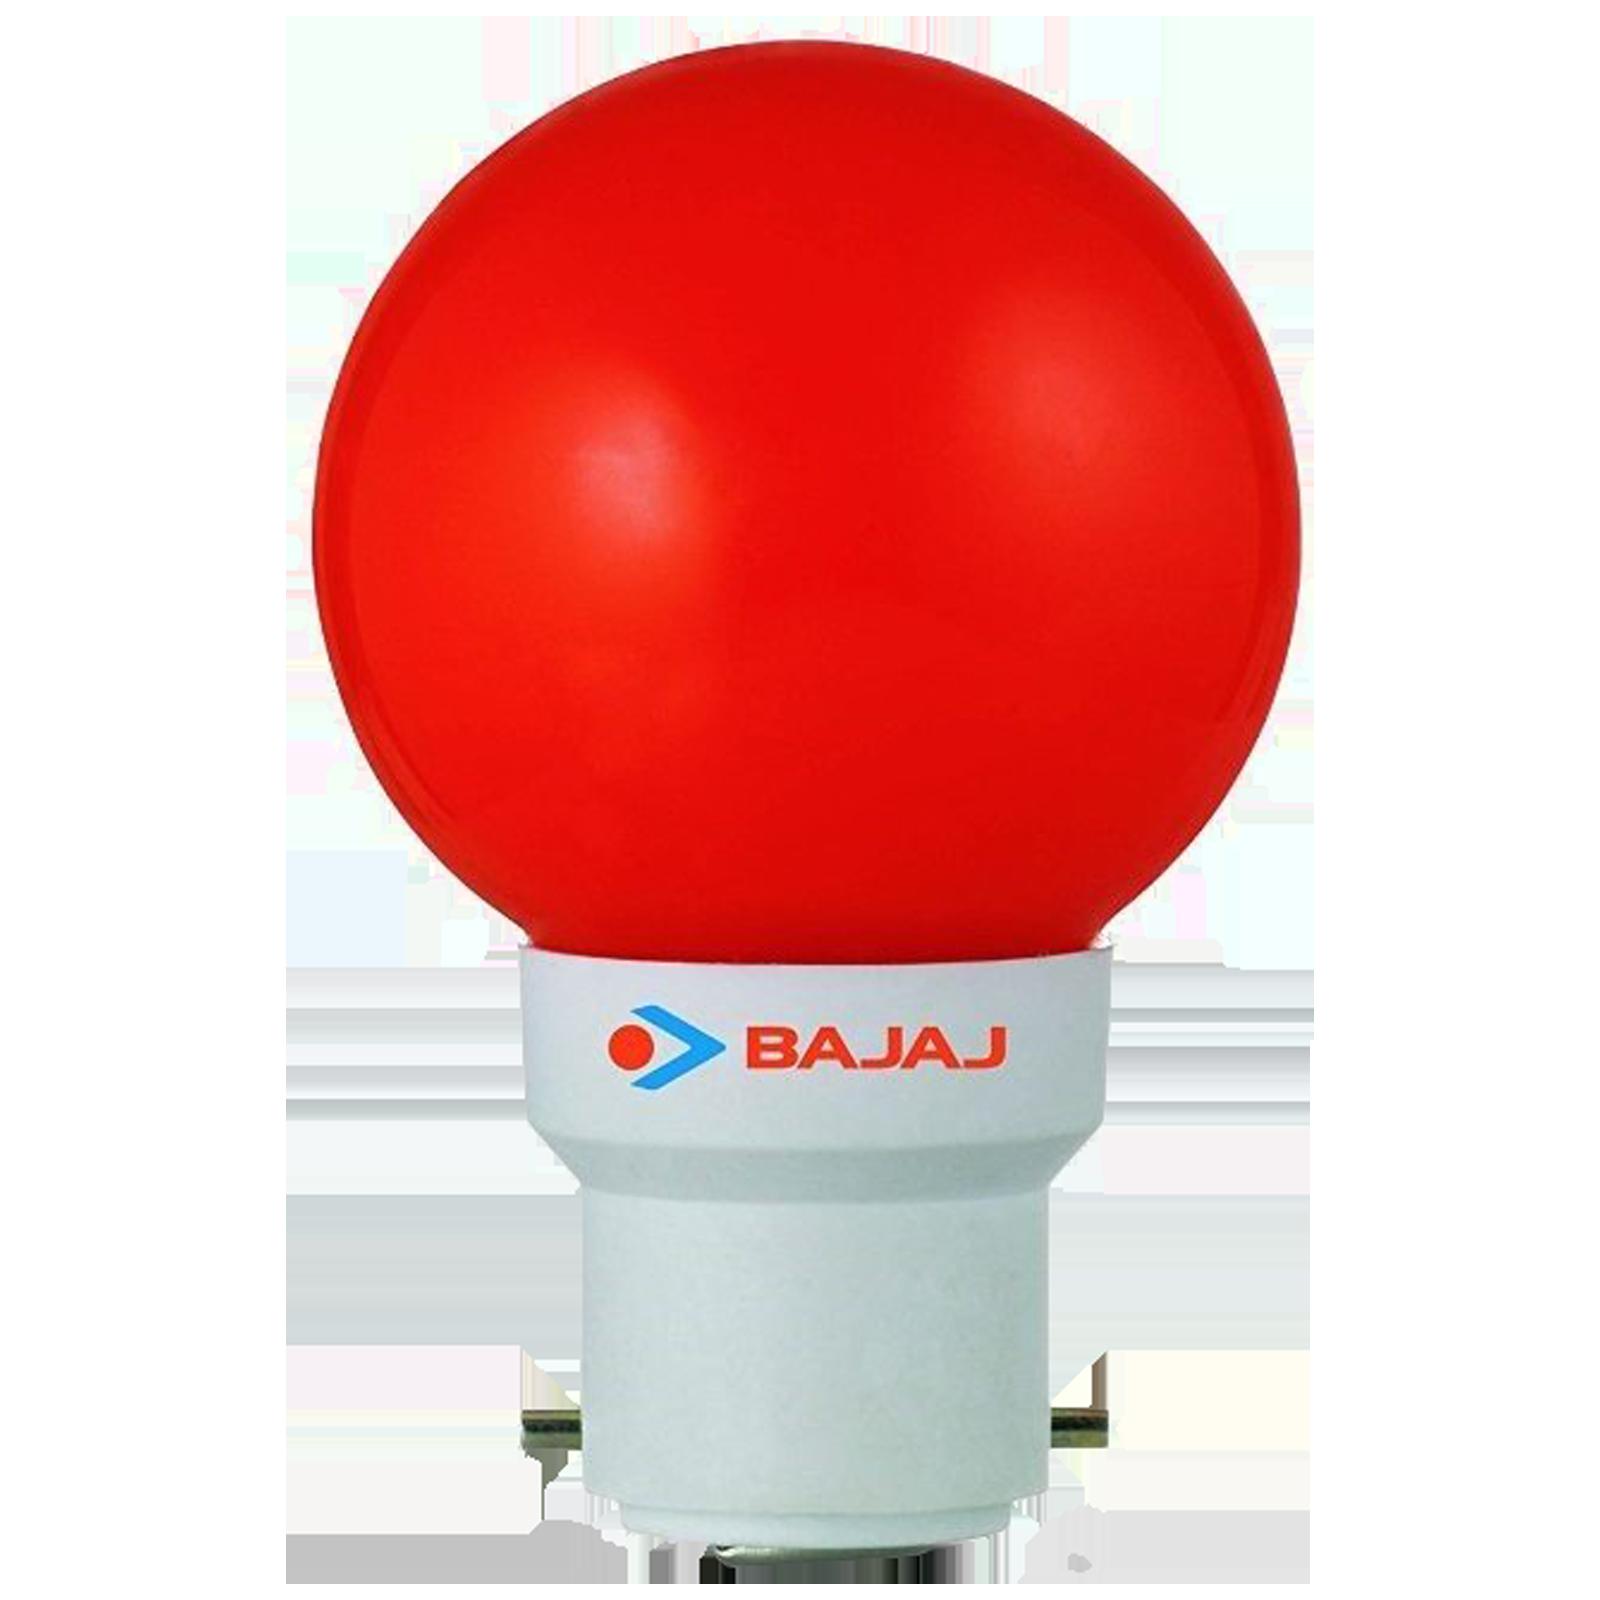 Bajaj Deco Ping Pong 0.5 Watts Electric Powered Night Lamp (1400 Lumens, 830023, Red/White)_1